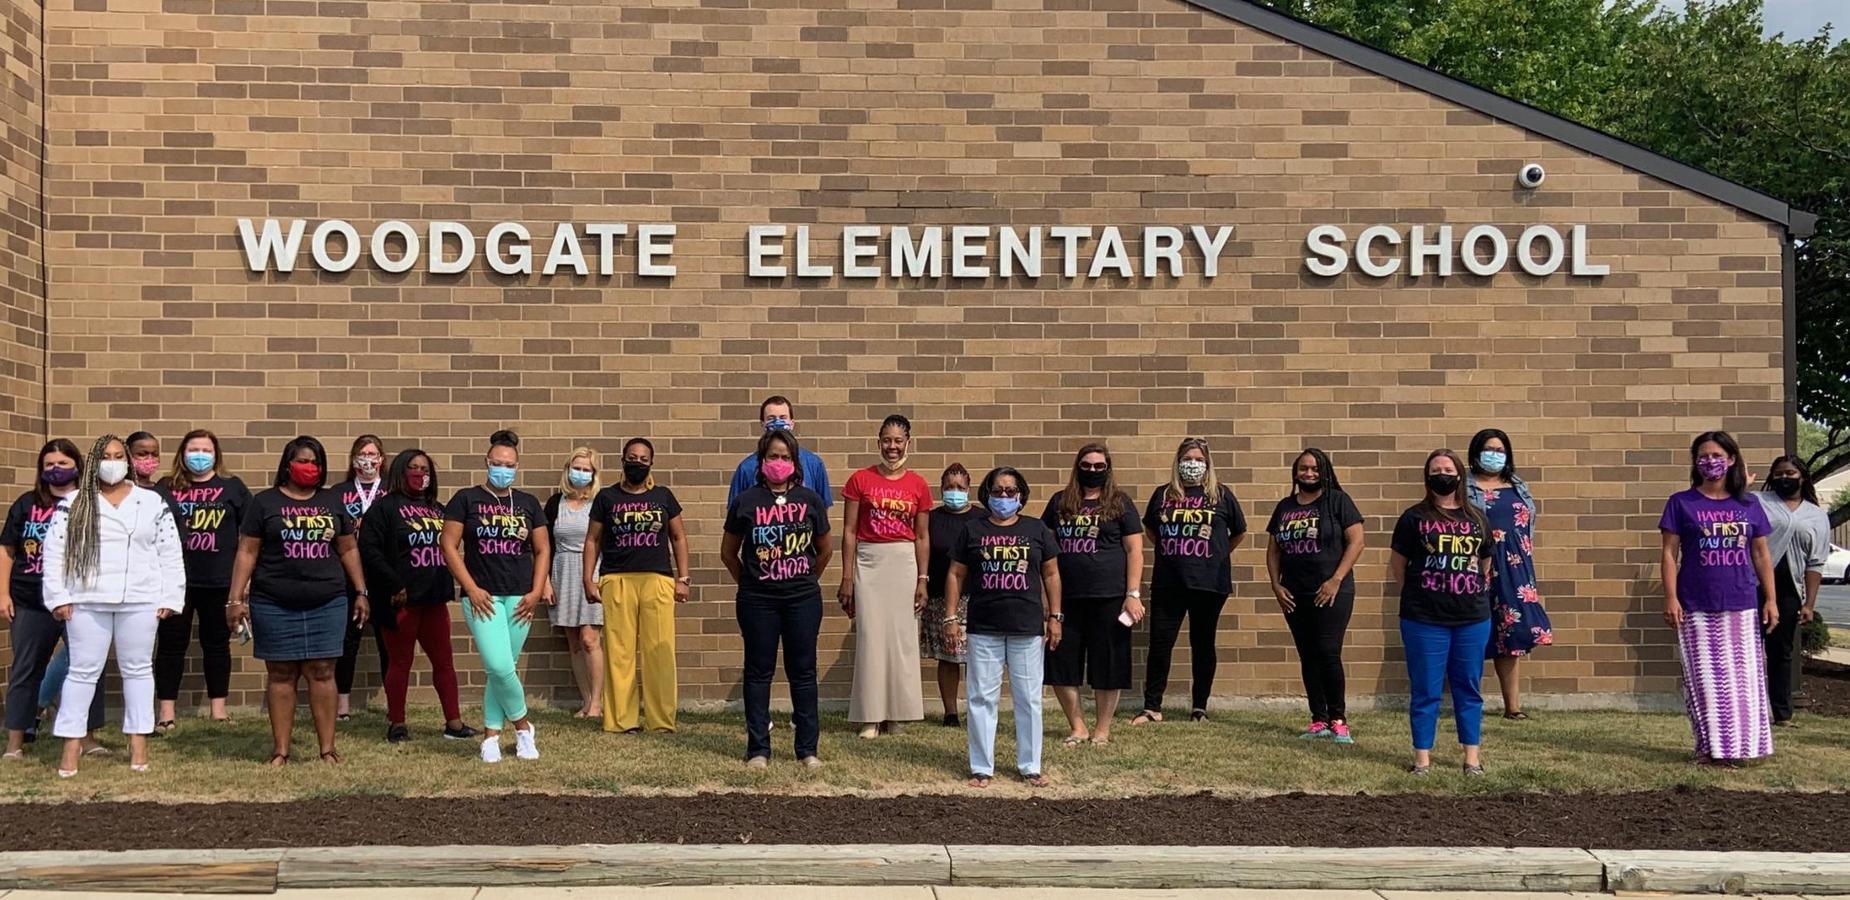 Woodgate Elementary School Staff